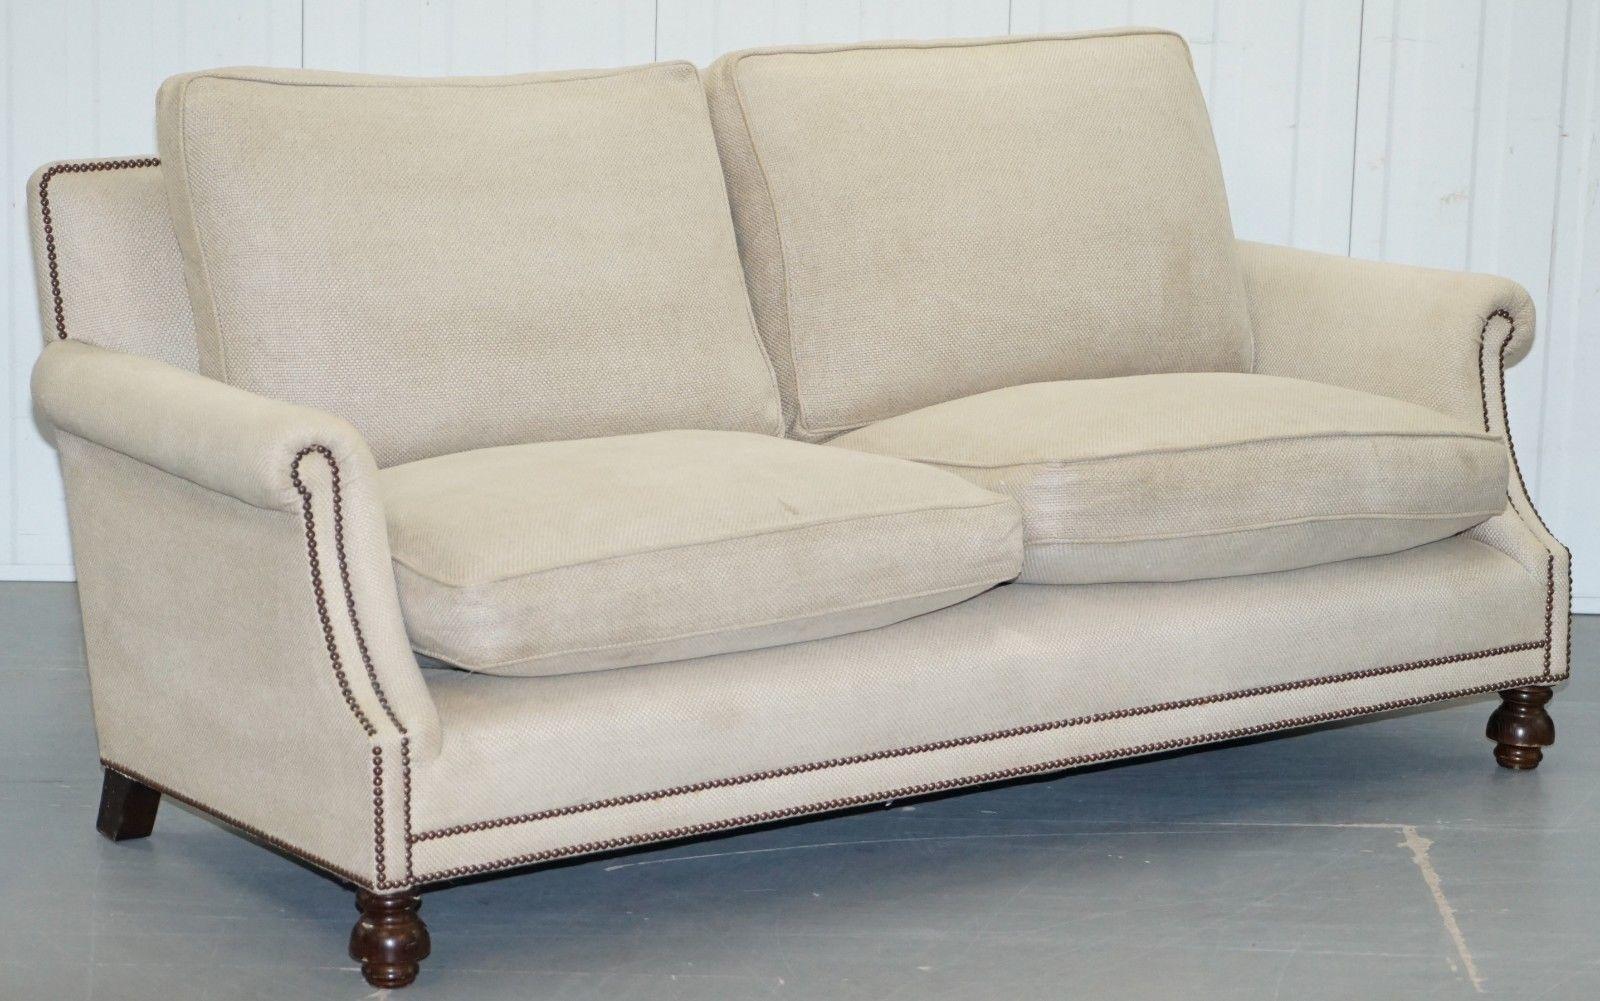 George Smith Arran Three Seater Sofa